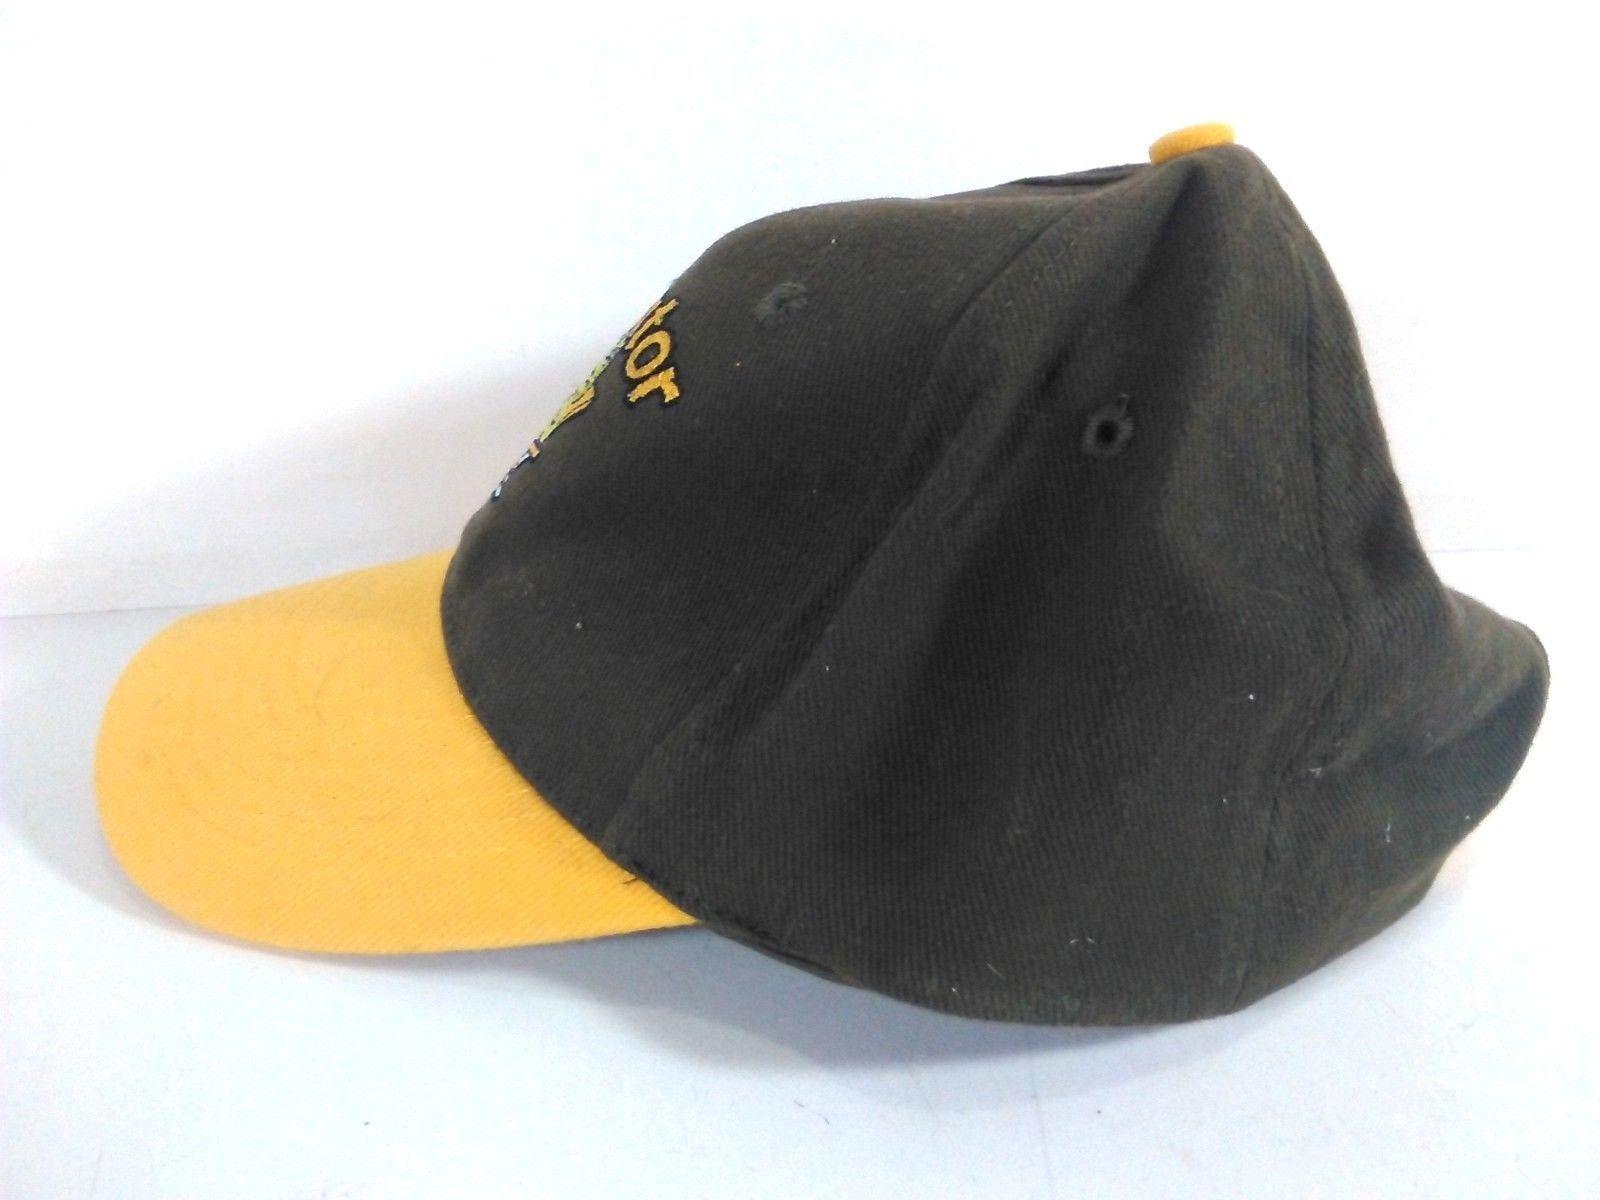 Tailgator Baseball Cap Hat Gators Green Yellow one size fits most